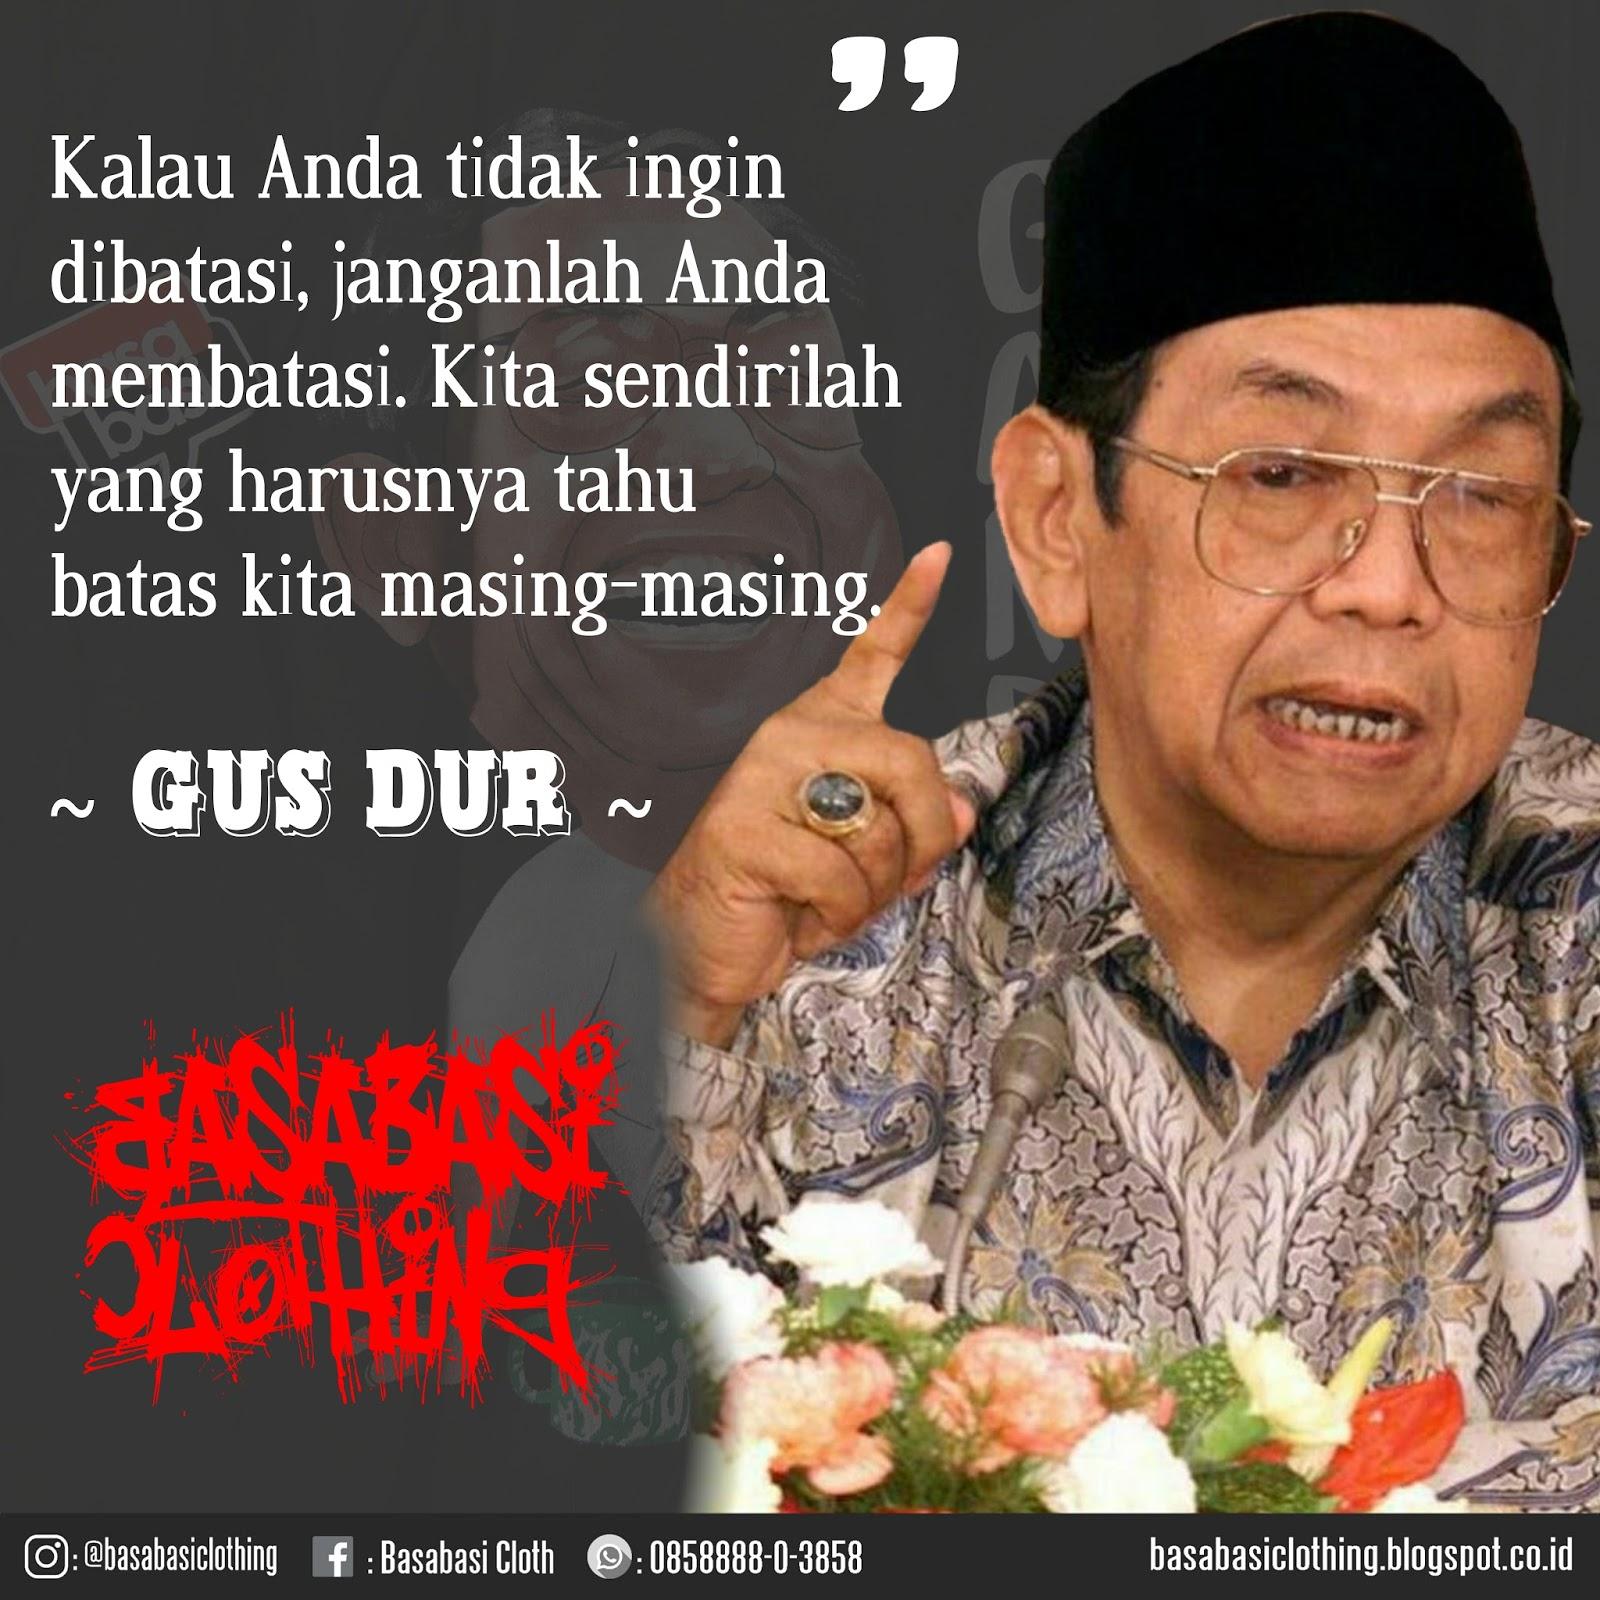 Kata Bijak Gus Dur Bahasa Jawa Cikimmcom